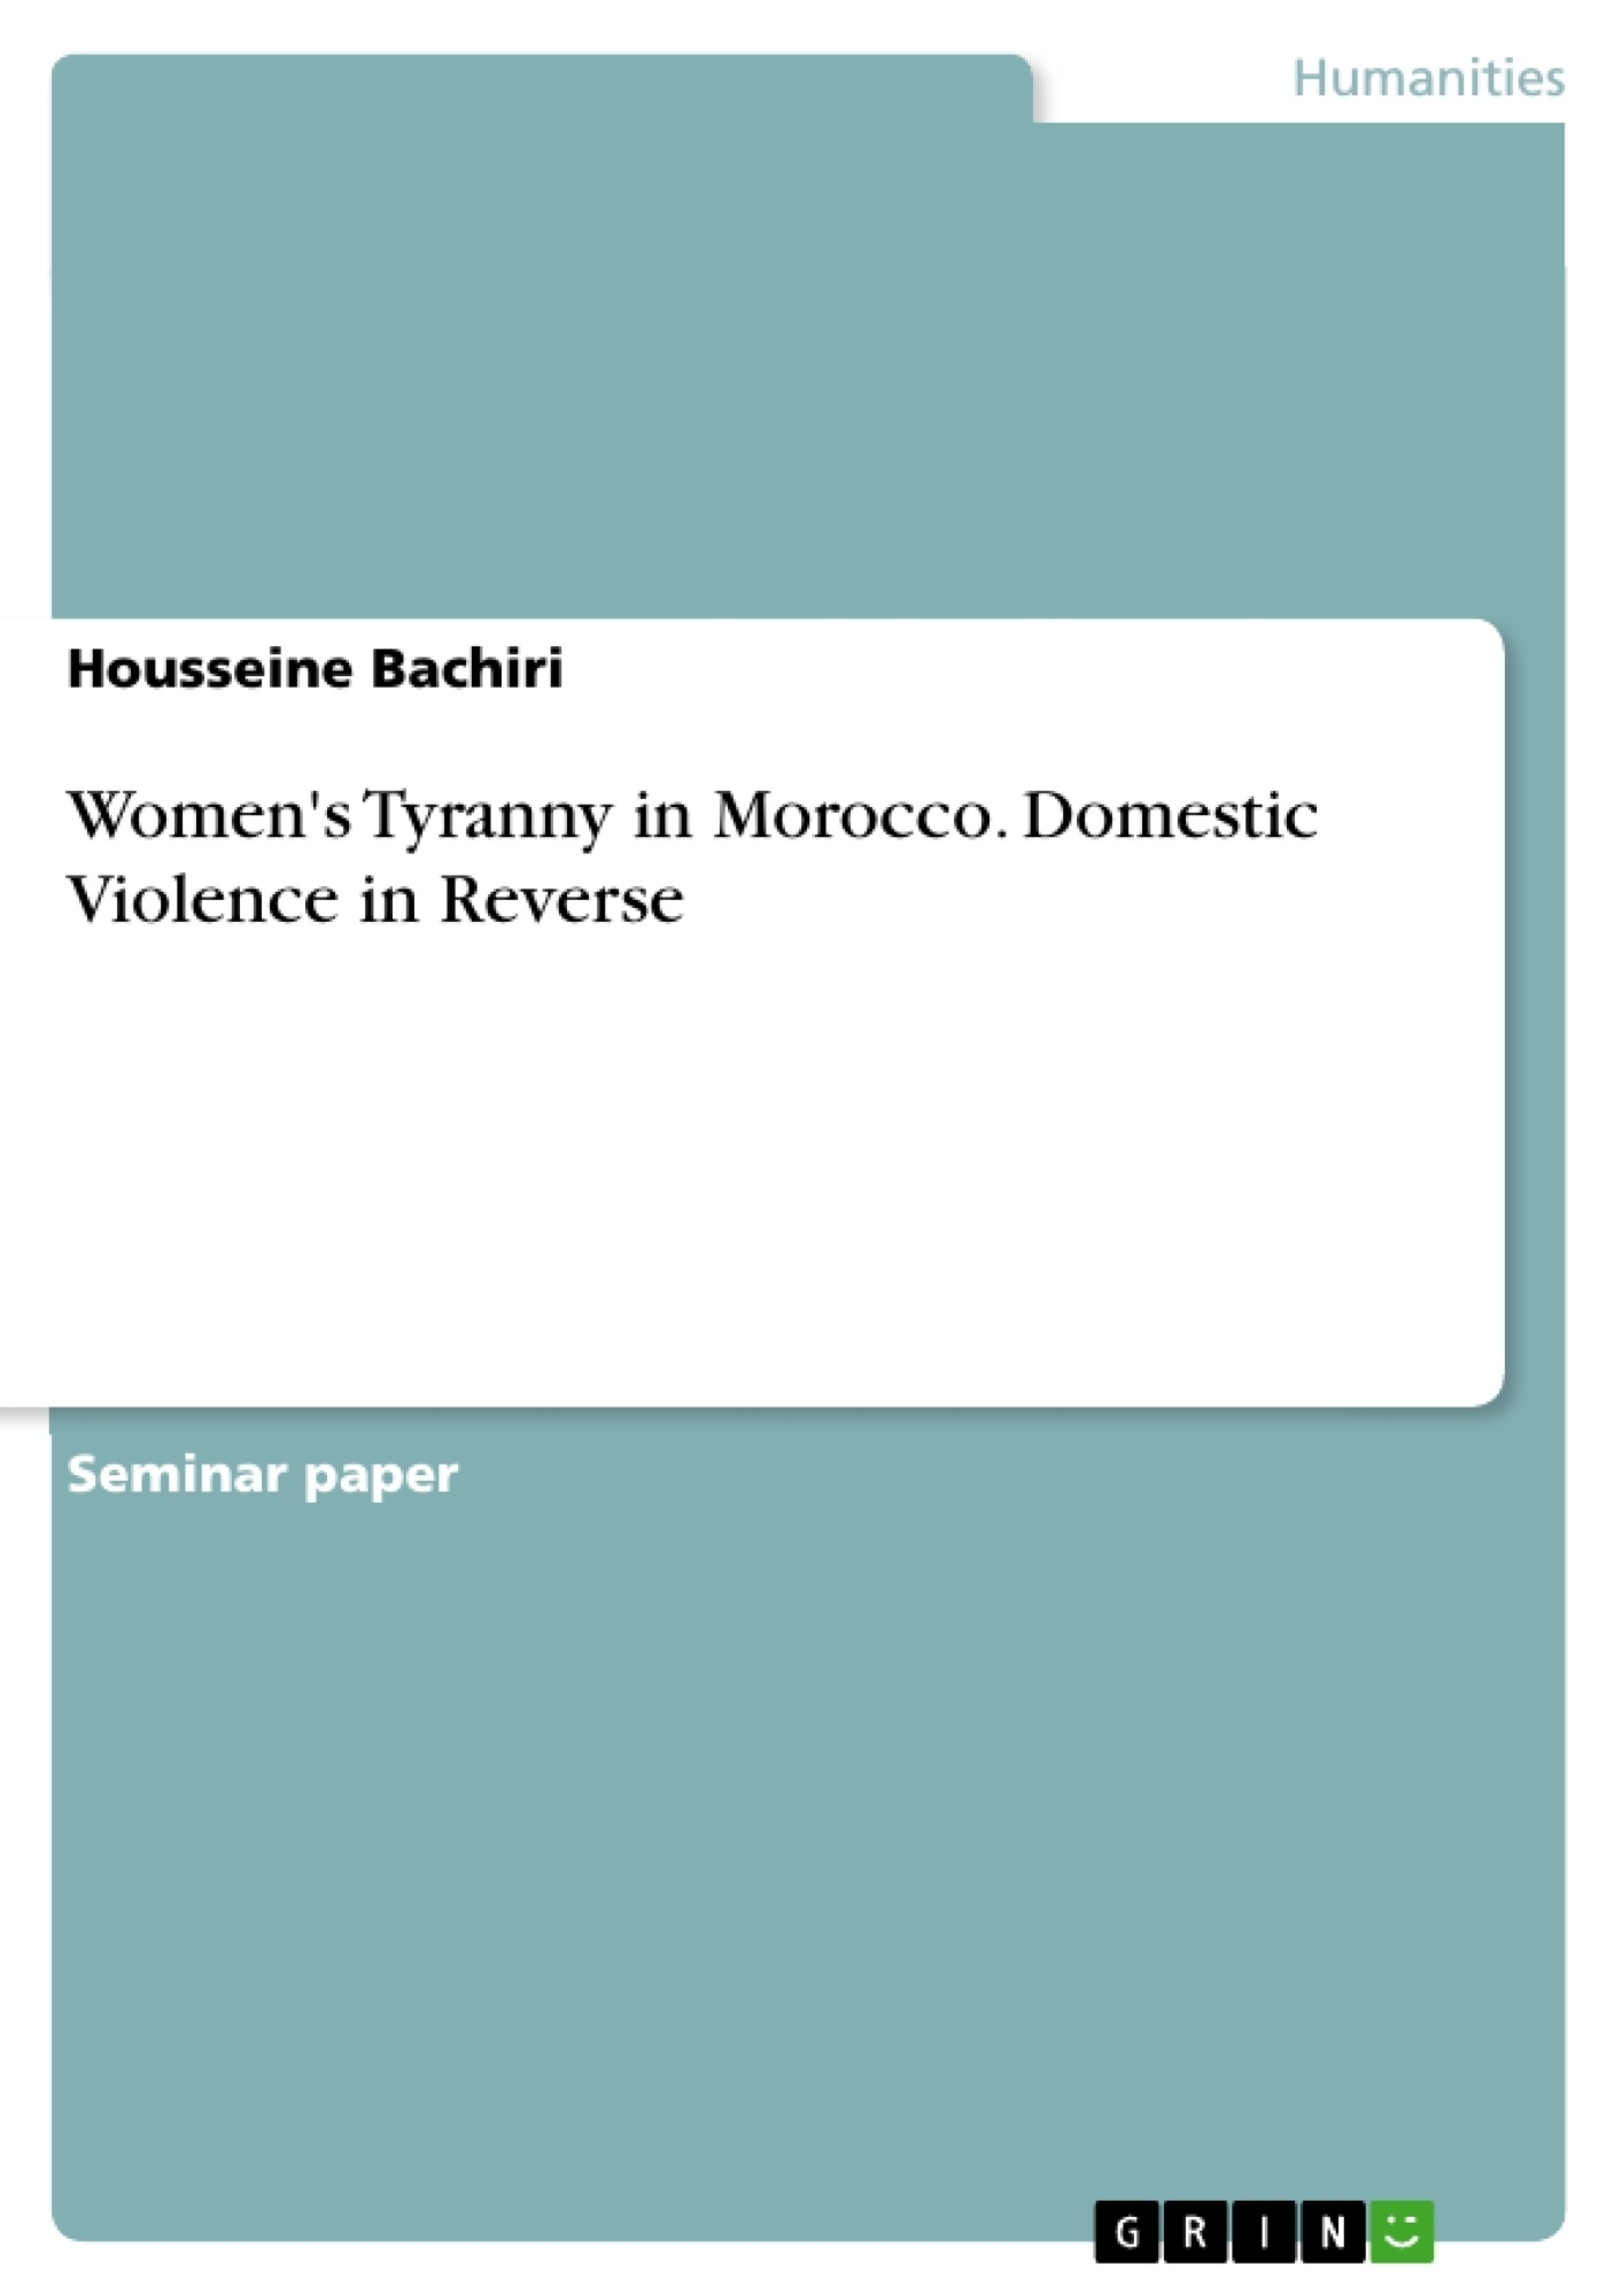 Title: Women's Tyranny in Morocco. Domestic Violence in Reverse